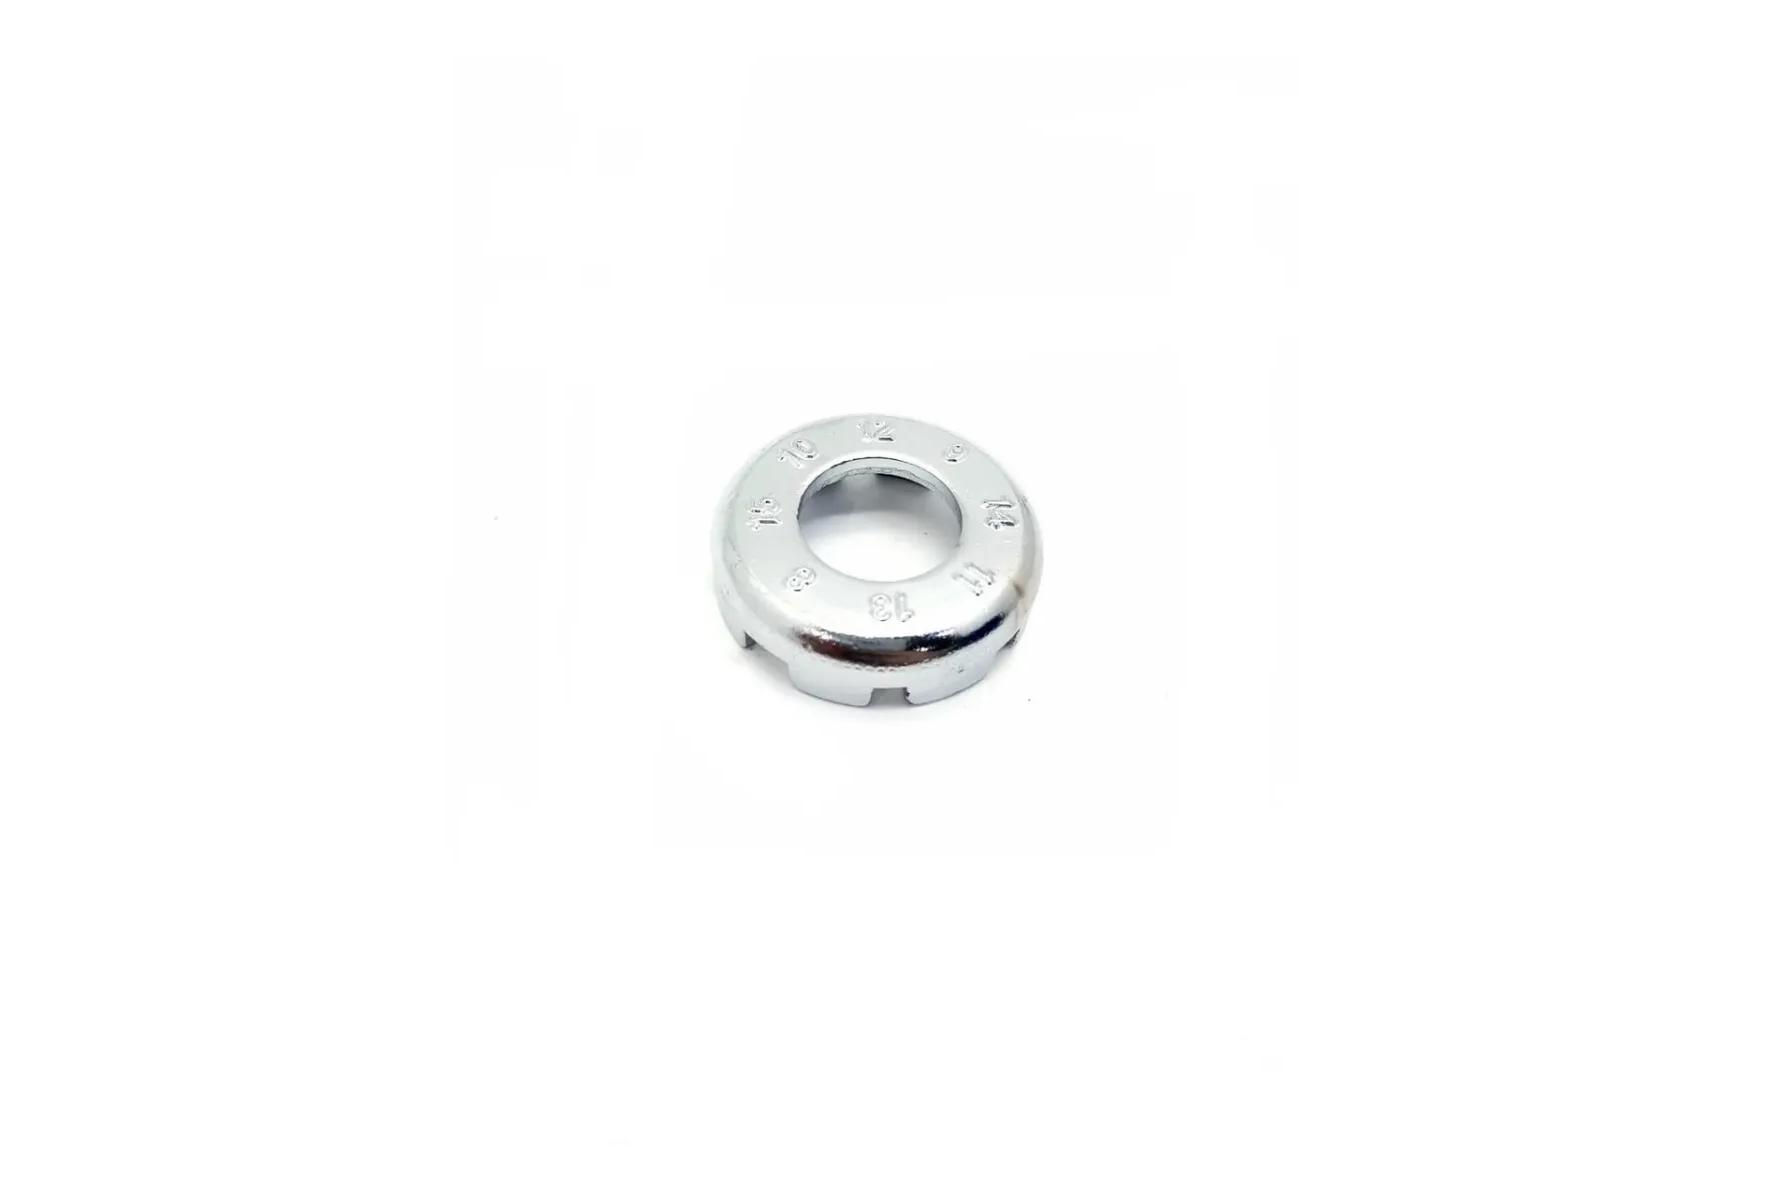 Chave de Raio para Mobilete / Bikelete / Wmx  (Universal)